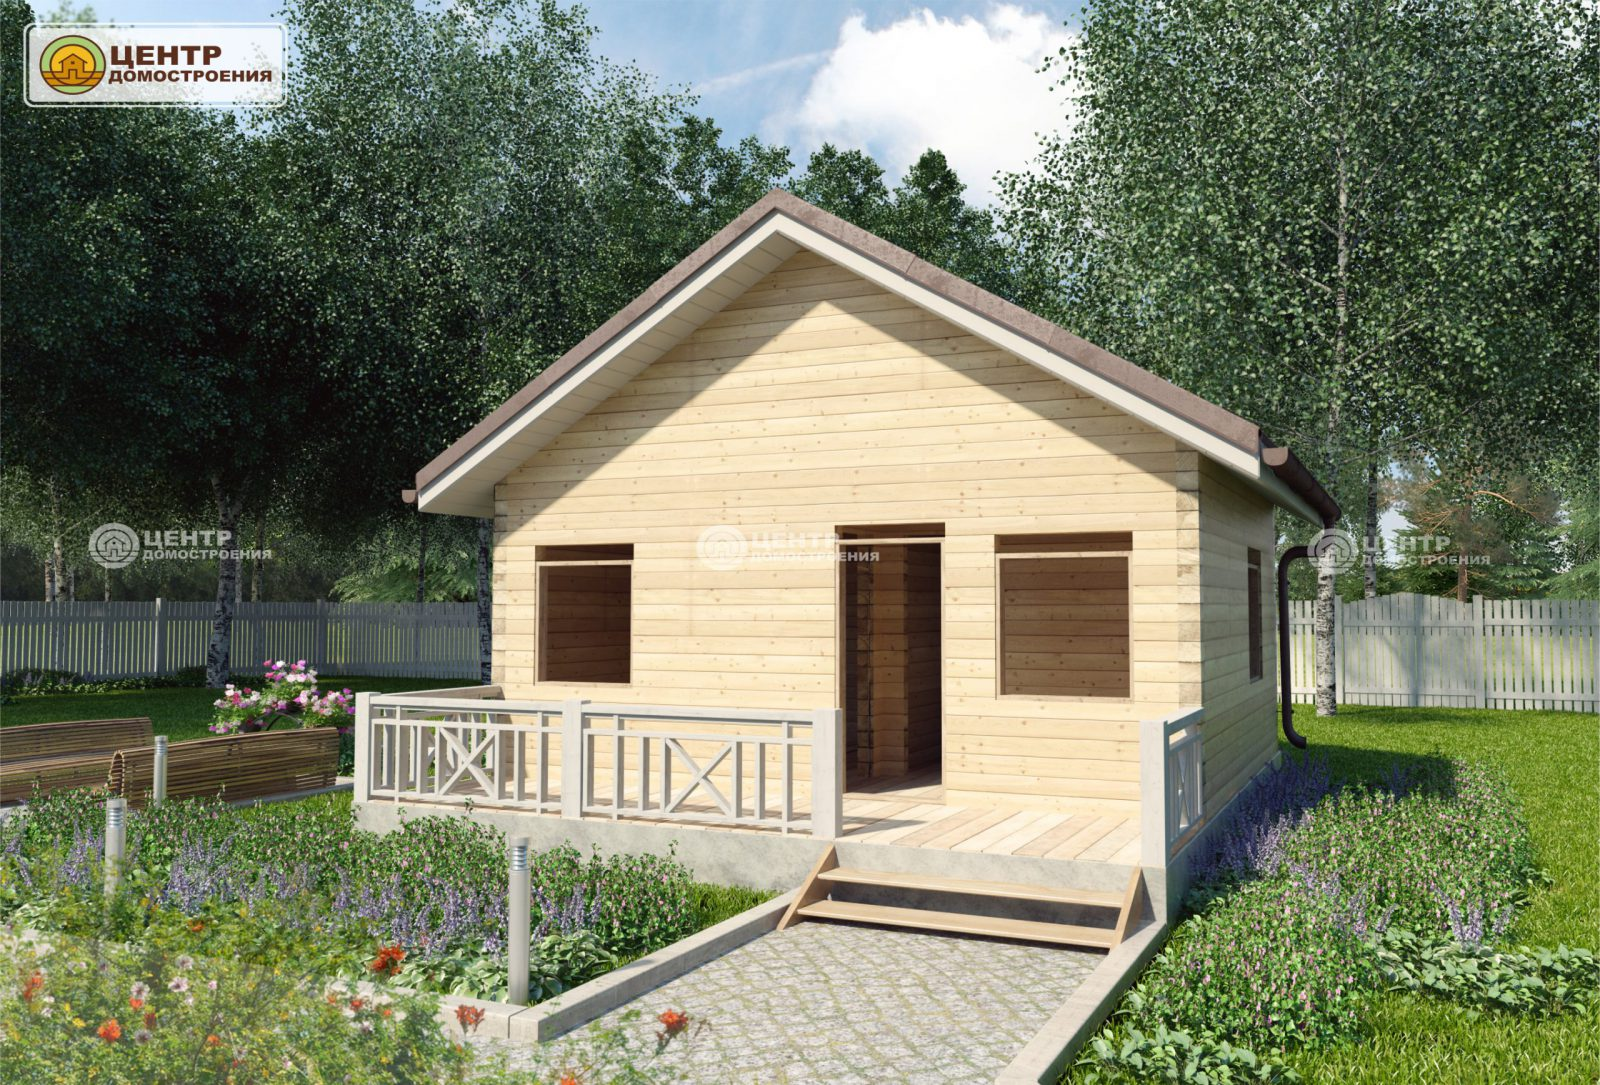 Проект одноэтажного дома 5 на 6